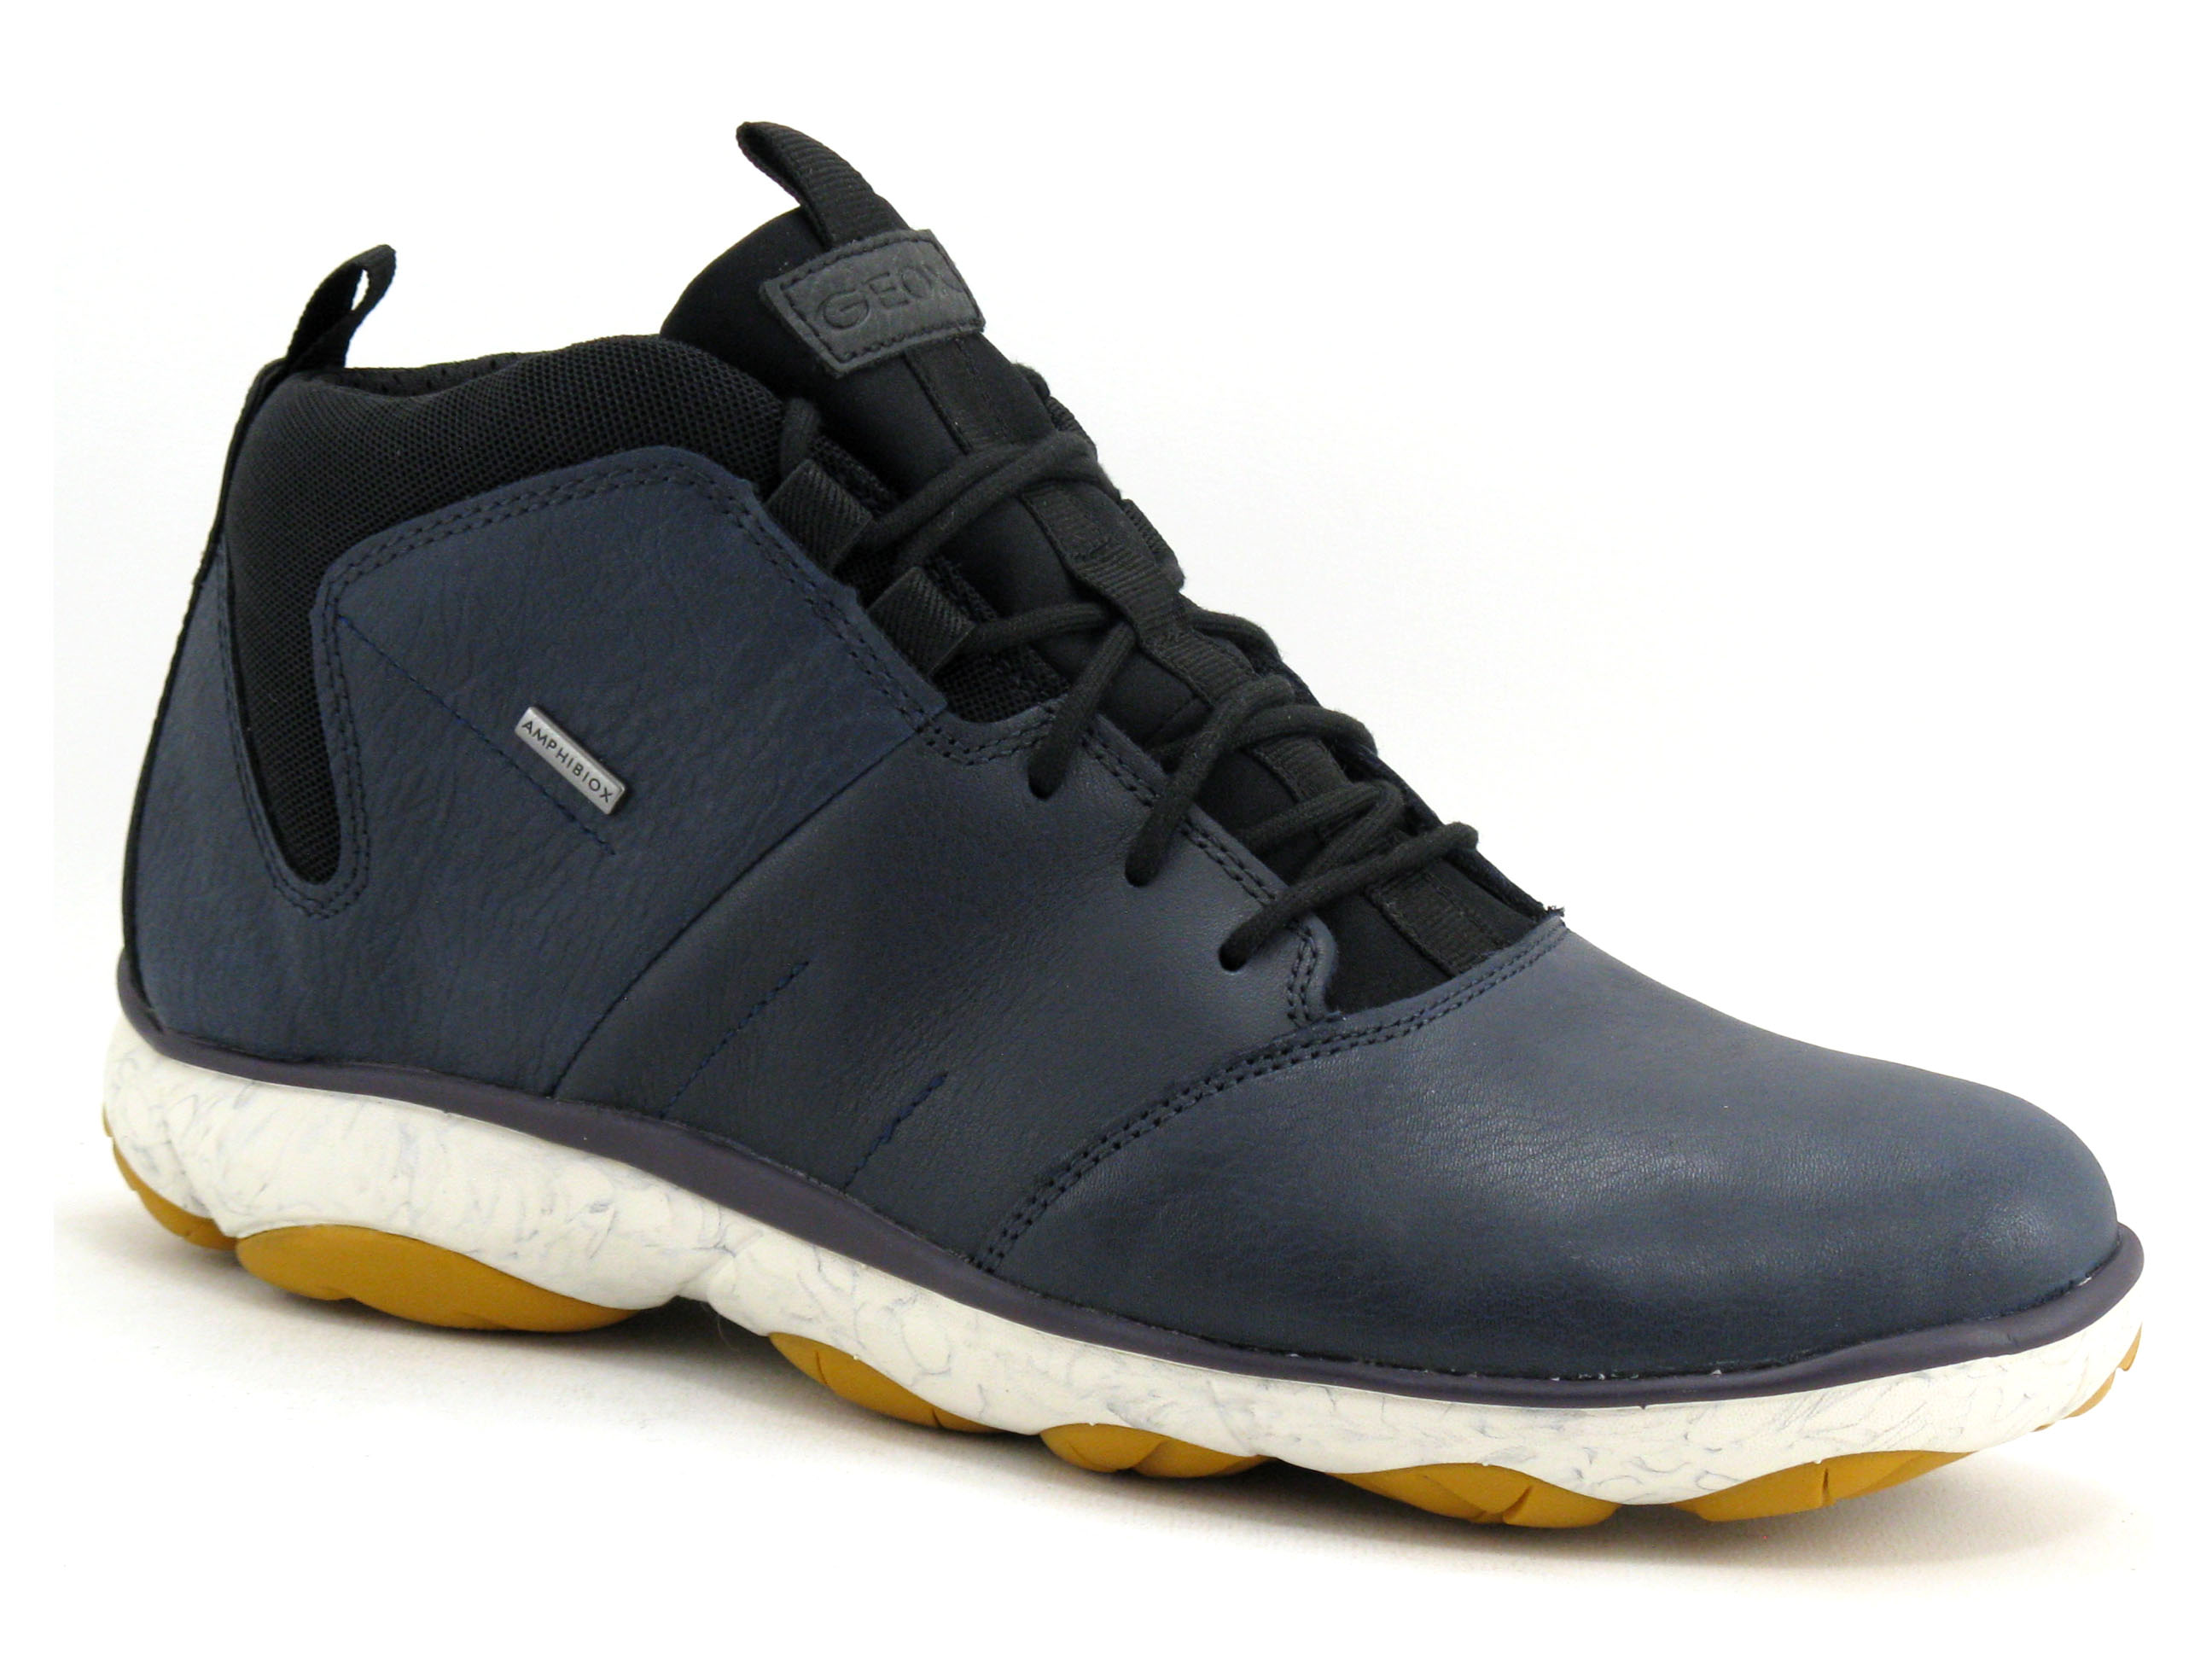 Boots homme geox u742va nebula navy - basket...